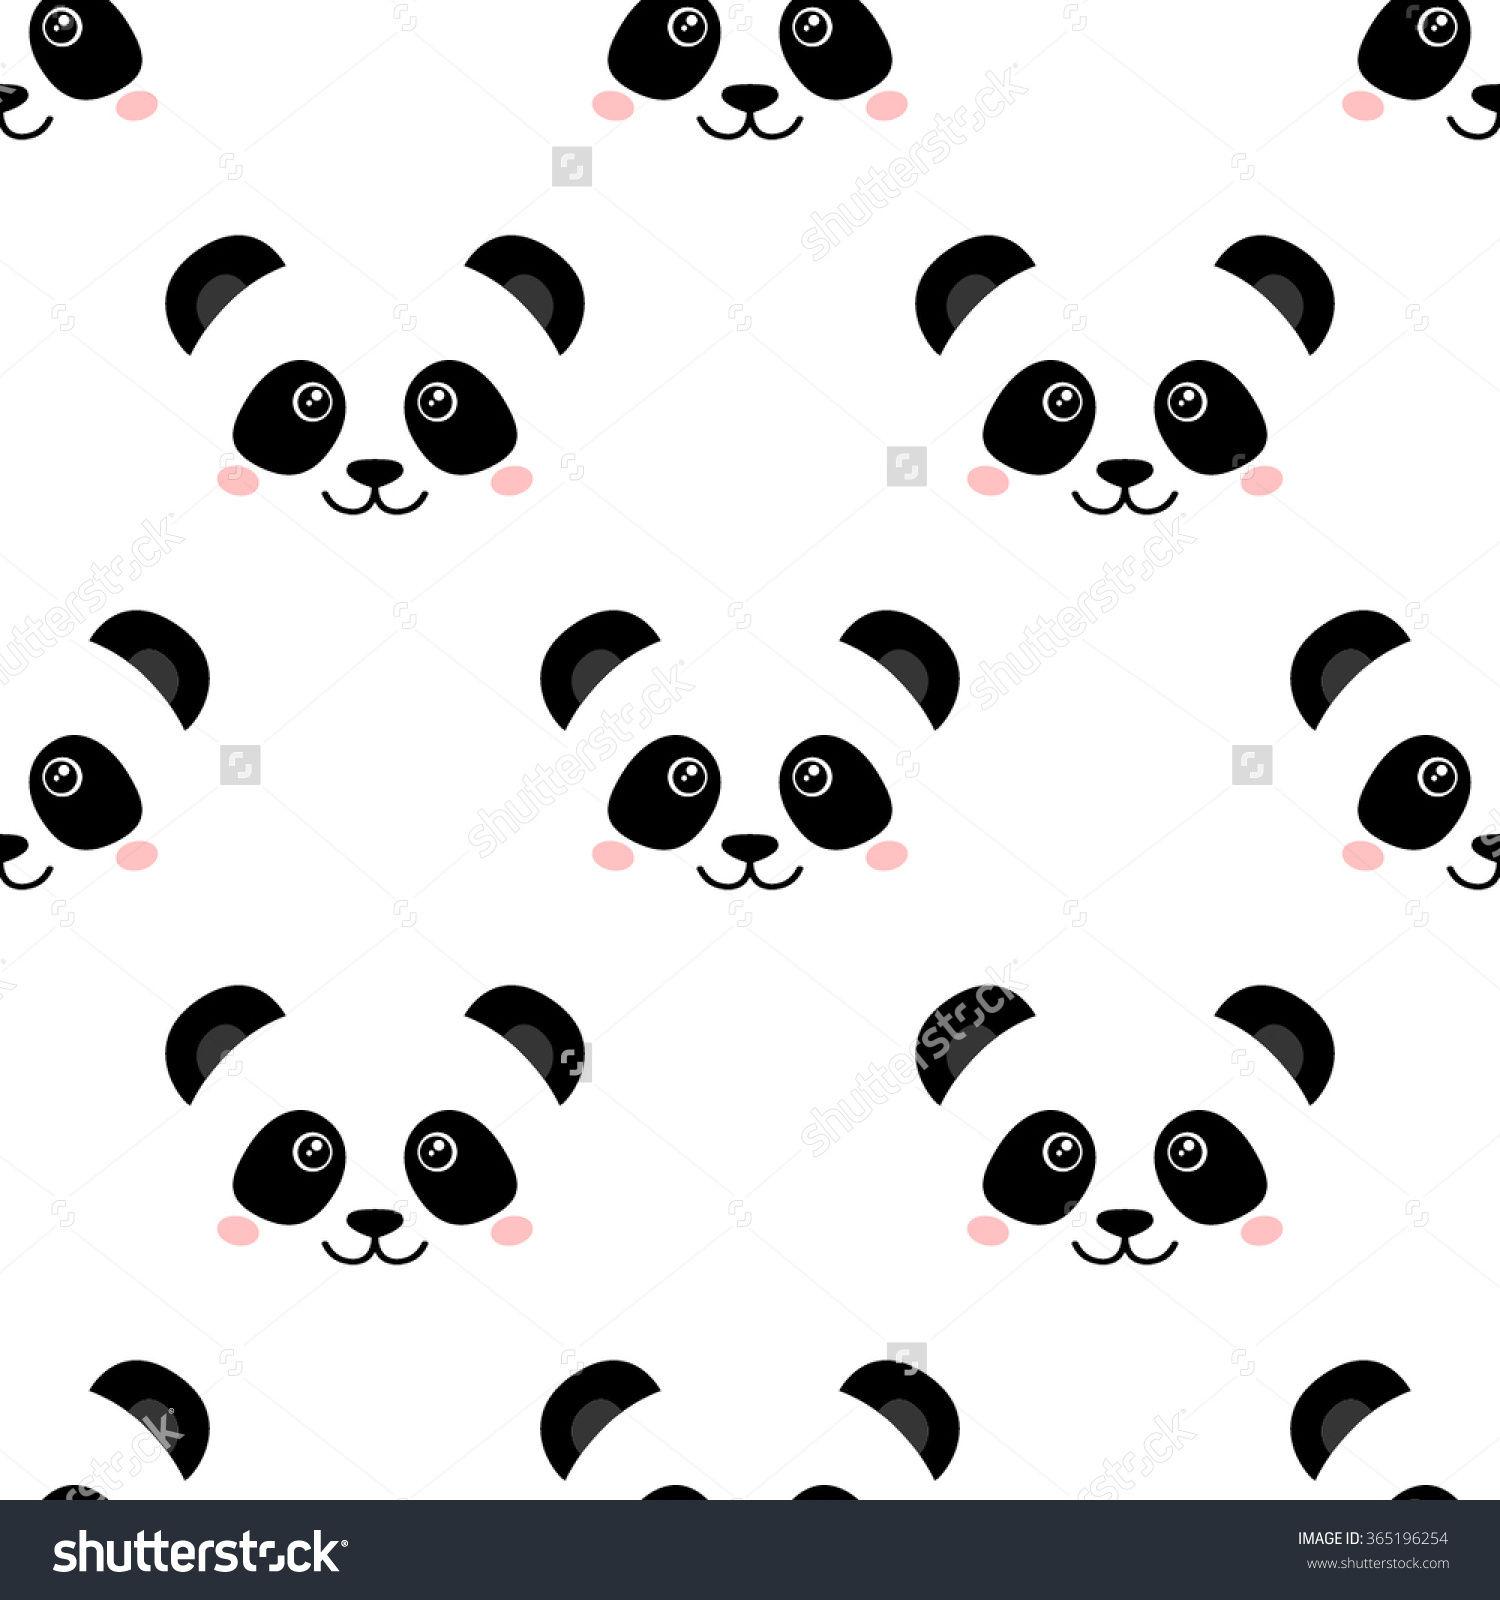 43 Gambar Kartun Panda Lucu Imut